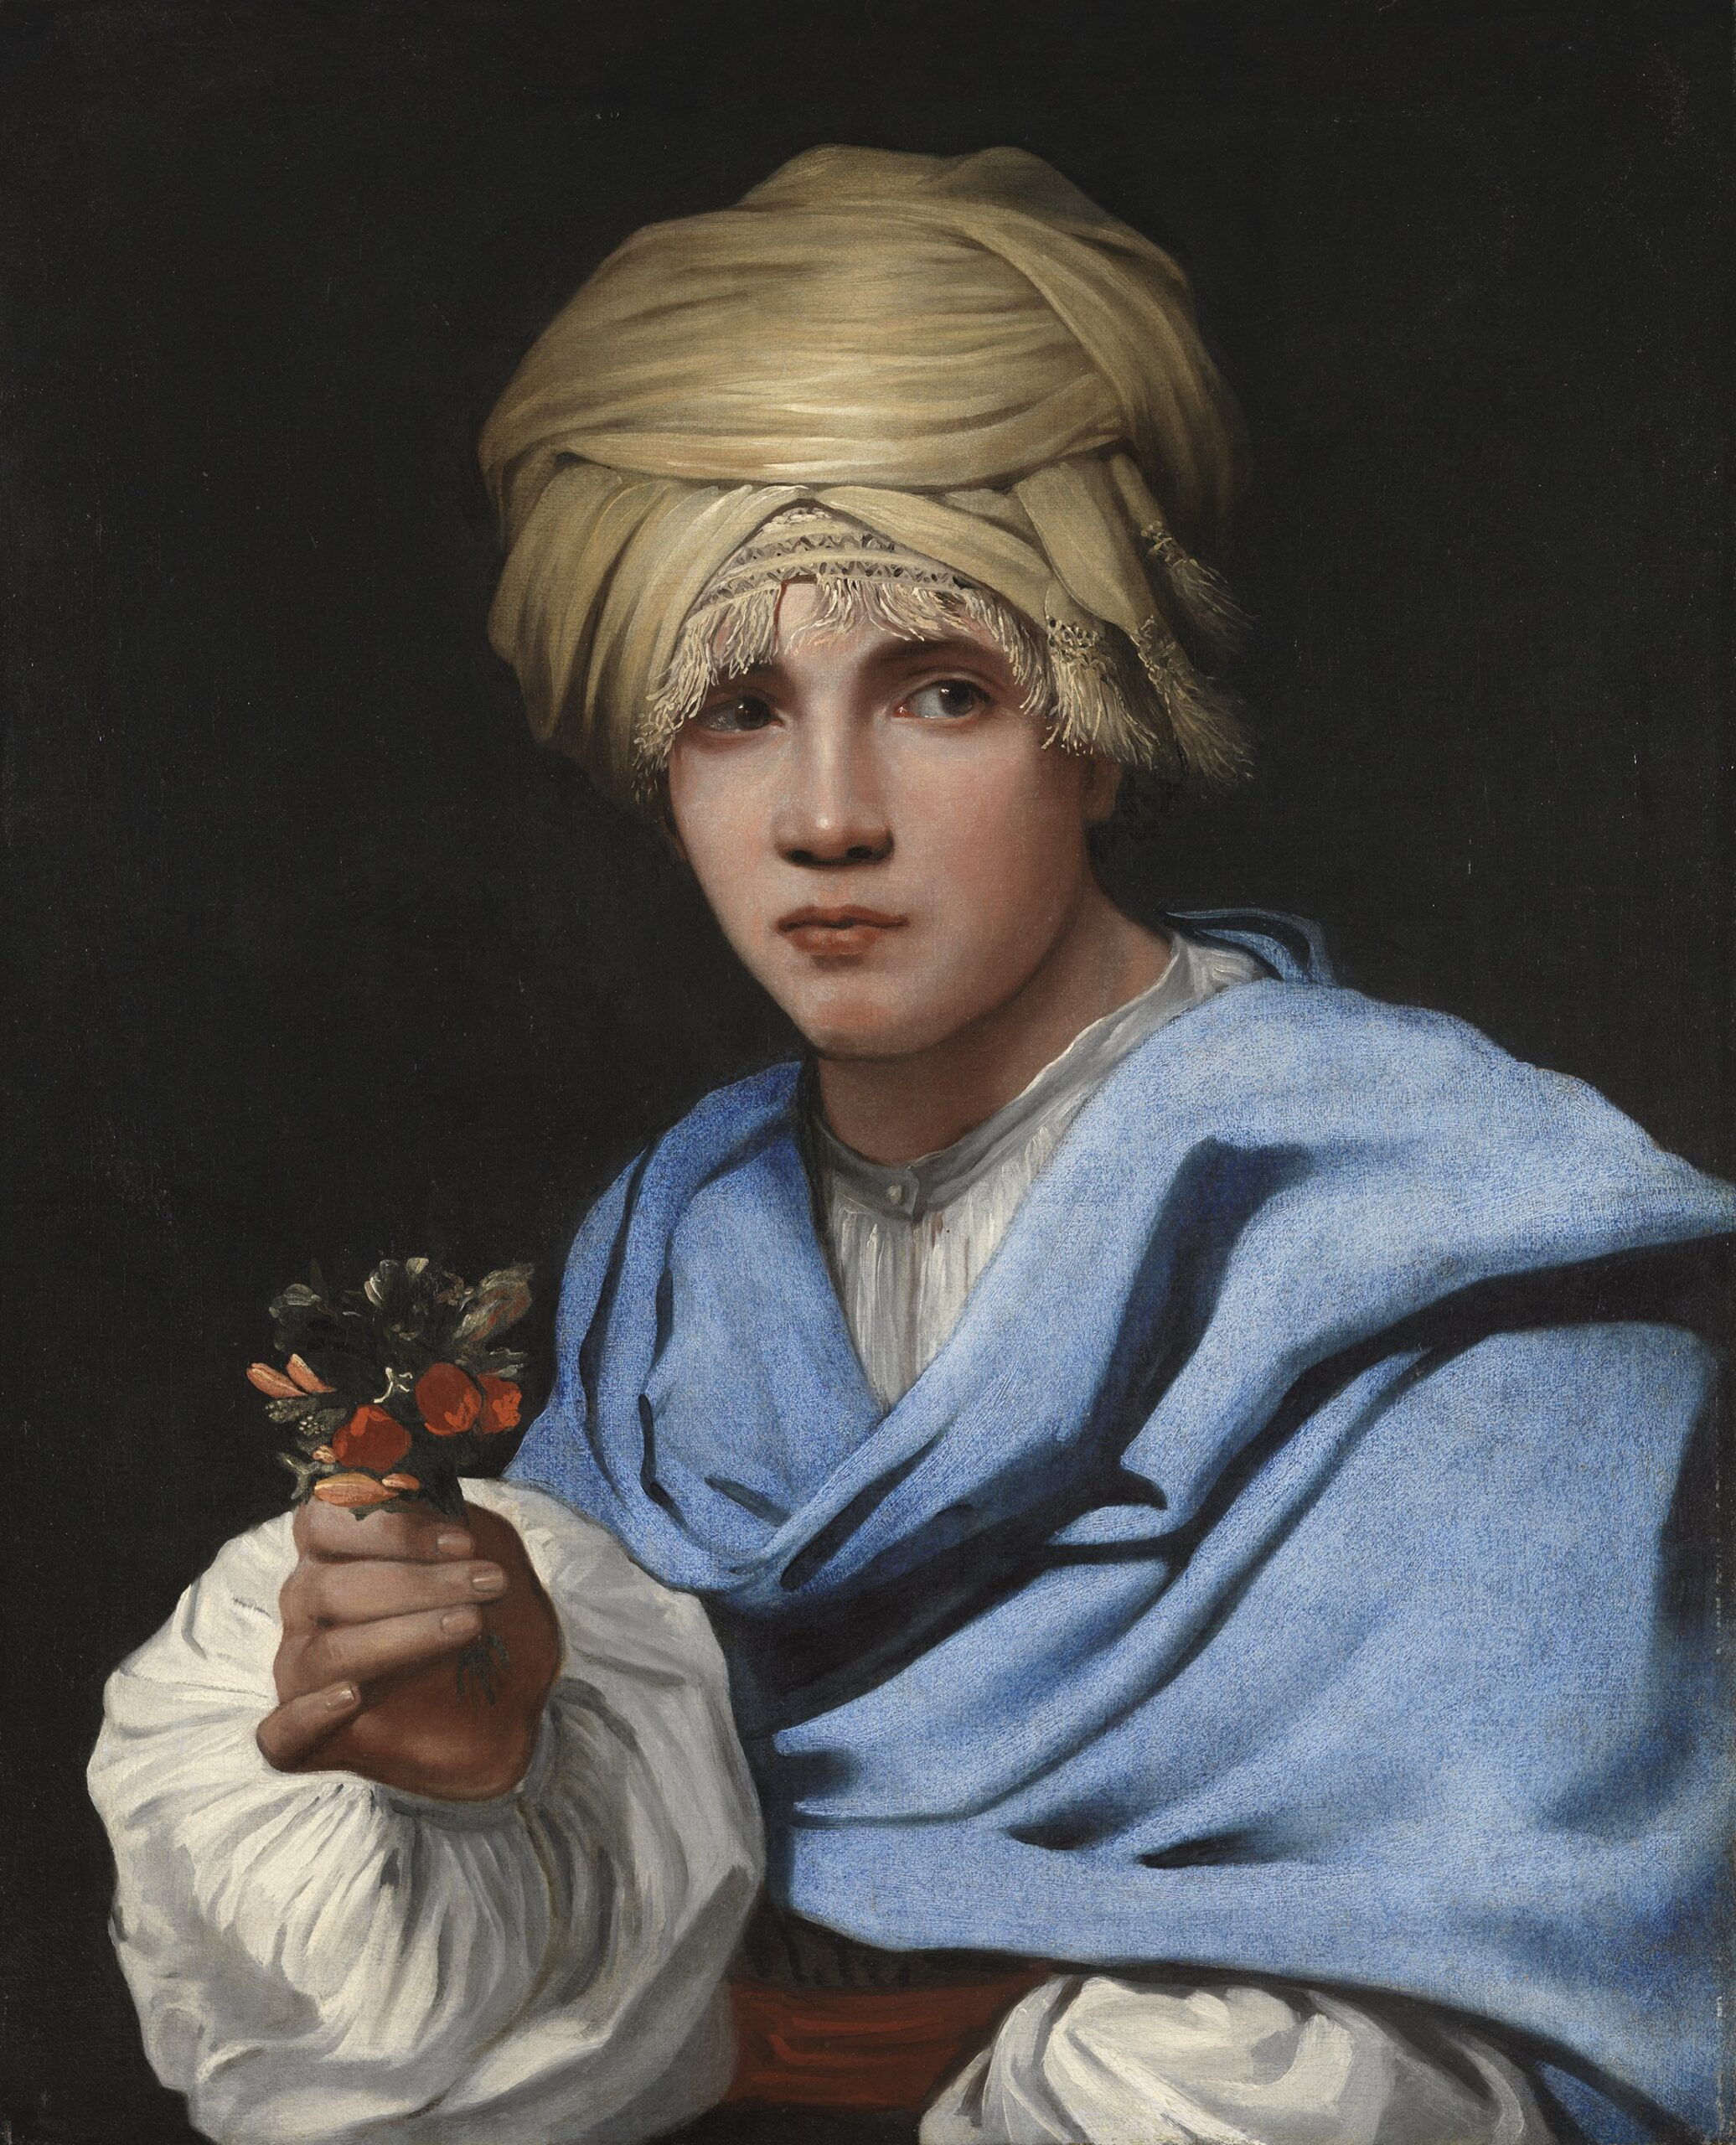 Muchacho con turbante y un ramillete de flores, Museo Thyssen-Bornemisza Madrid